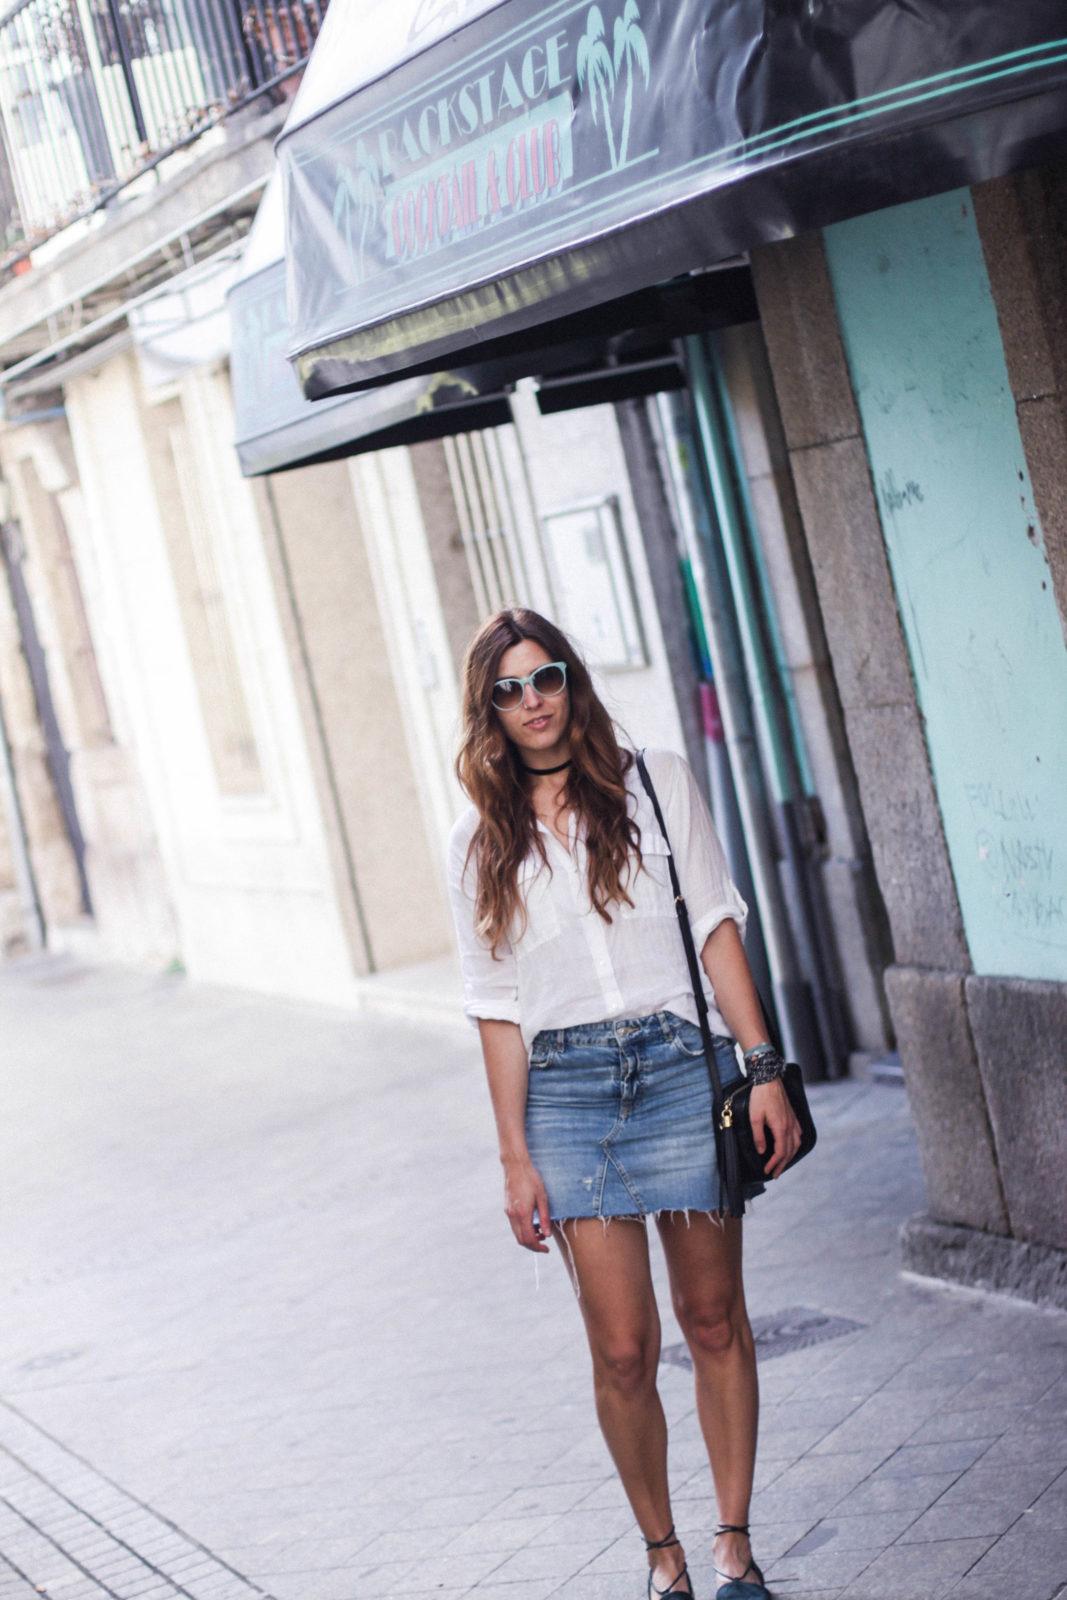 denim_skirt_falda_vaquera_camisa_blanca_alpargatas_espadrilles_look_summer_2016_street_style